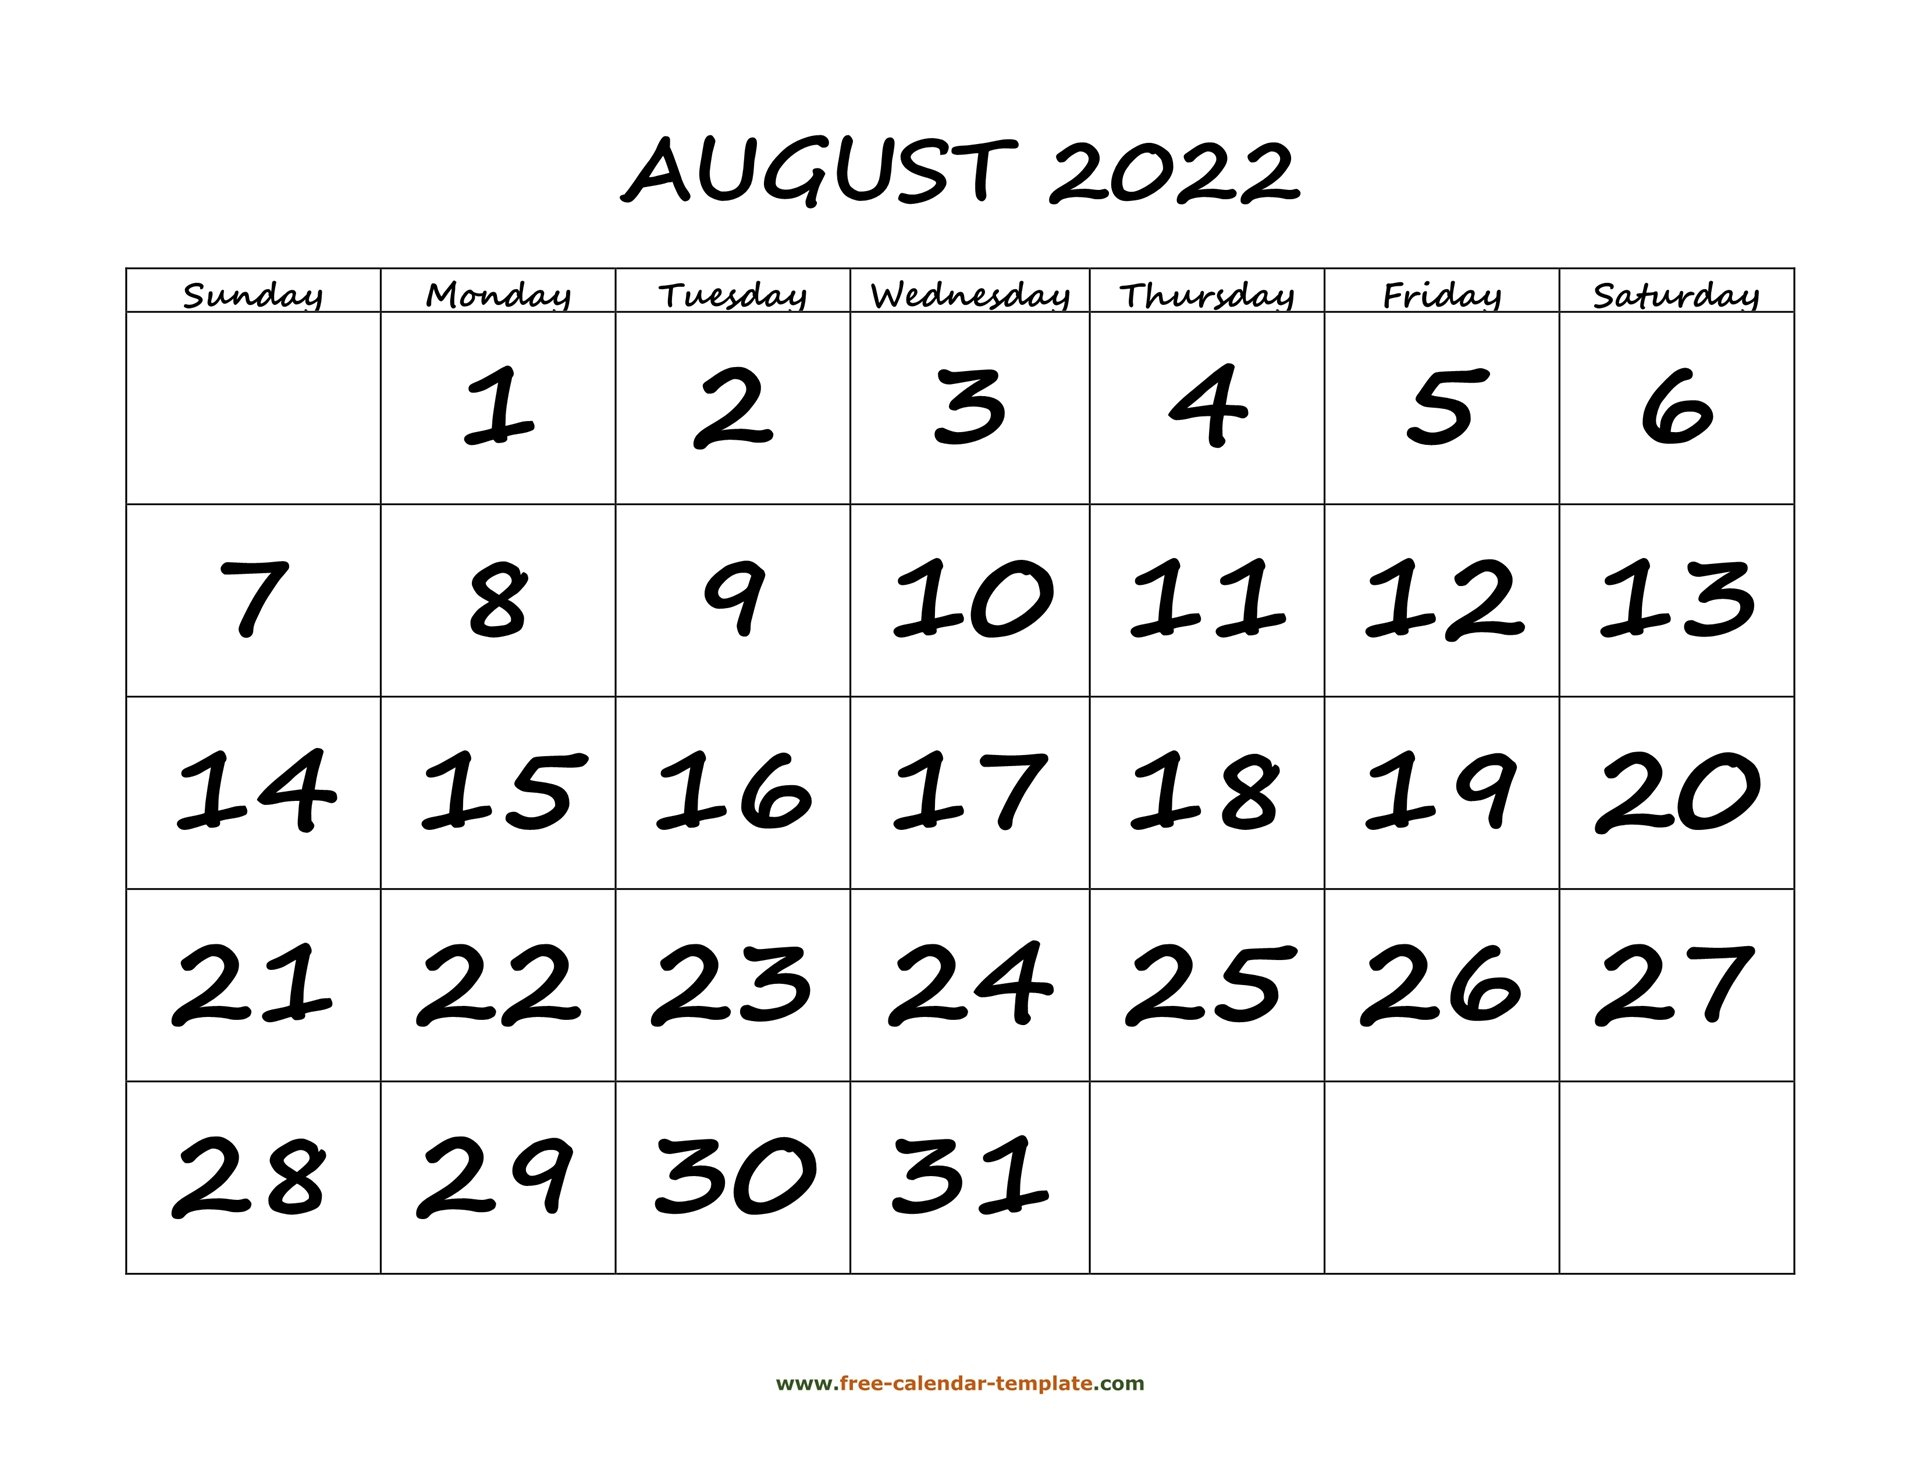 August 2022 Free Calendar Tempplate   Free-Calendar within Printable 2022 August Calendar